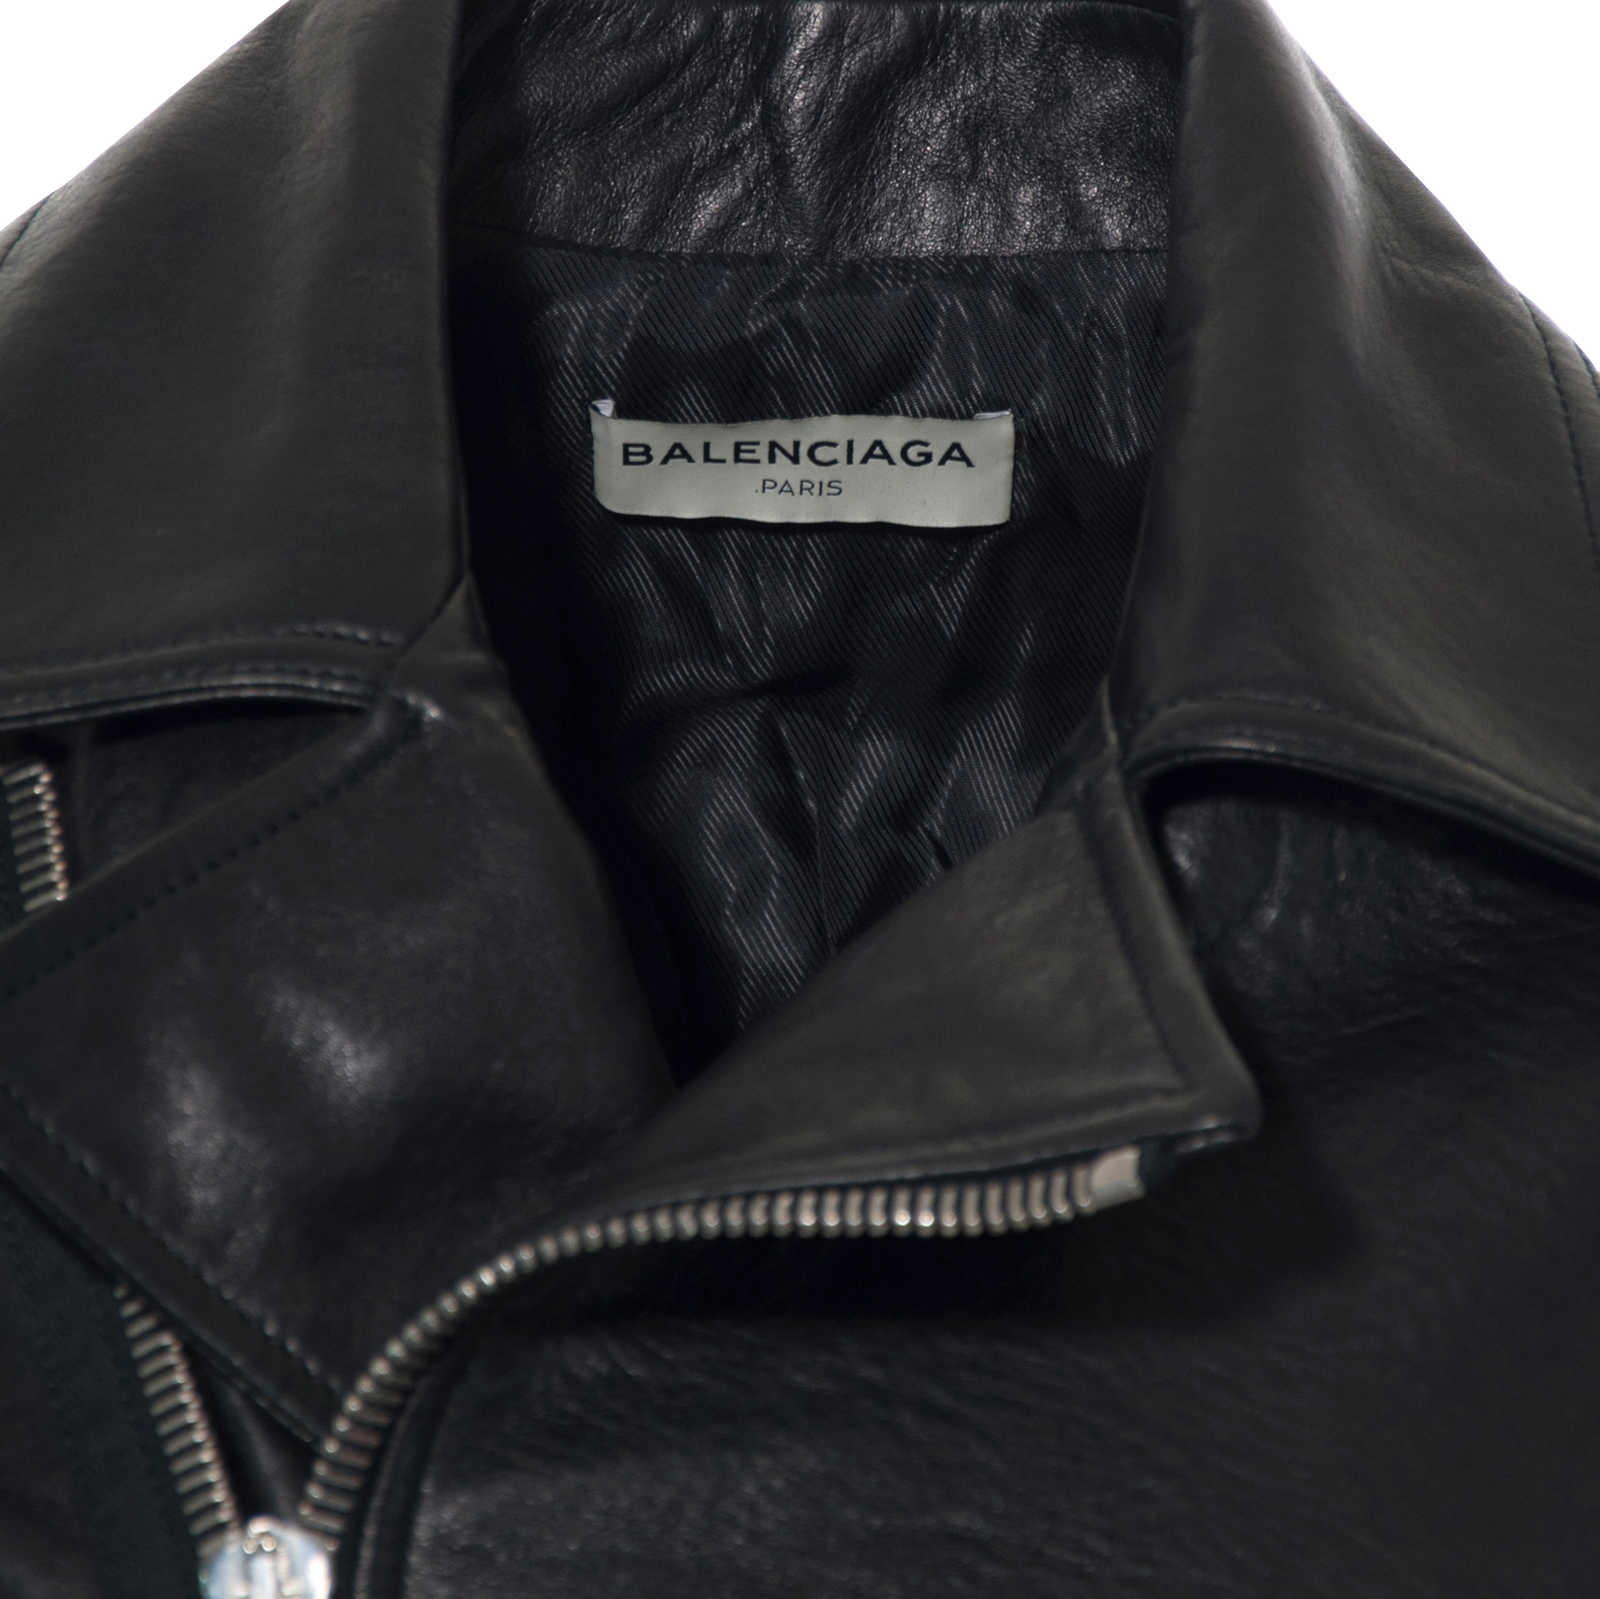 e88c61dcb833 ... Authentic Second Hand Balenciaga Biker Jacket (PSS-265-00123) -  Thumbnail 2